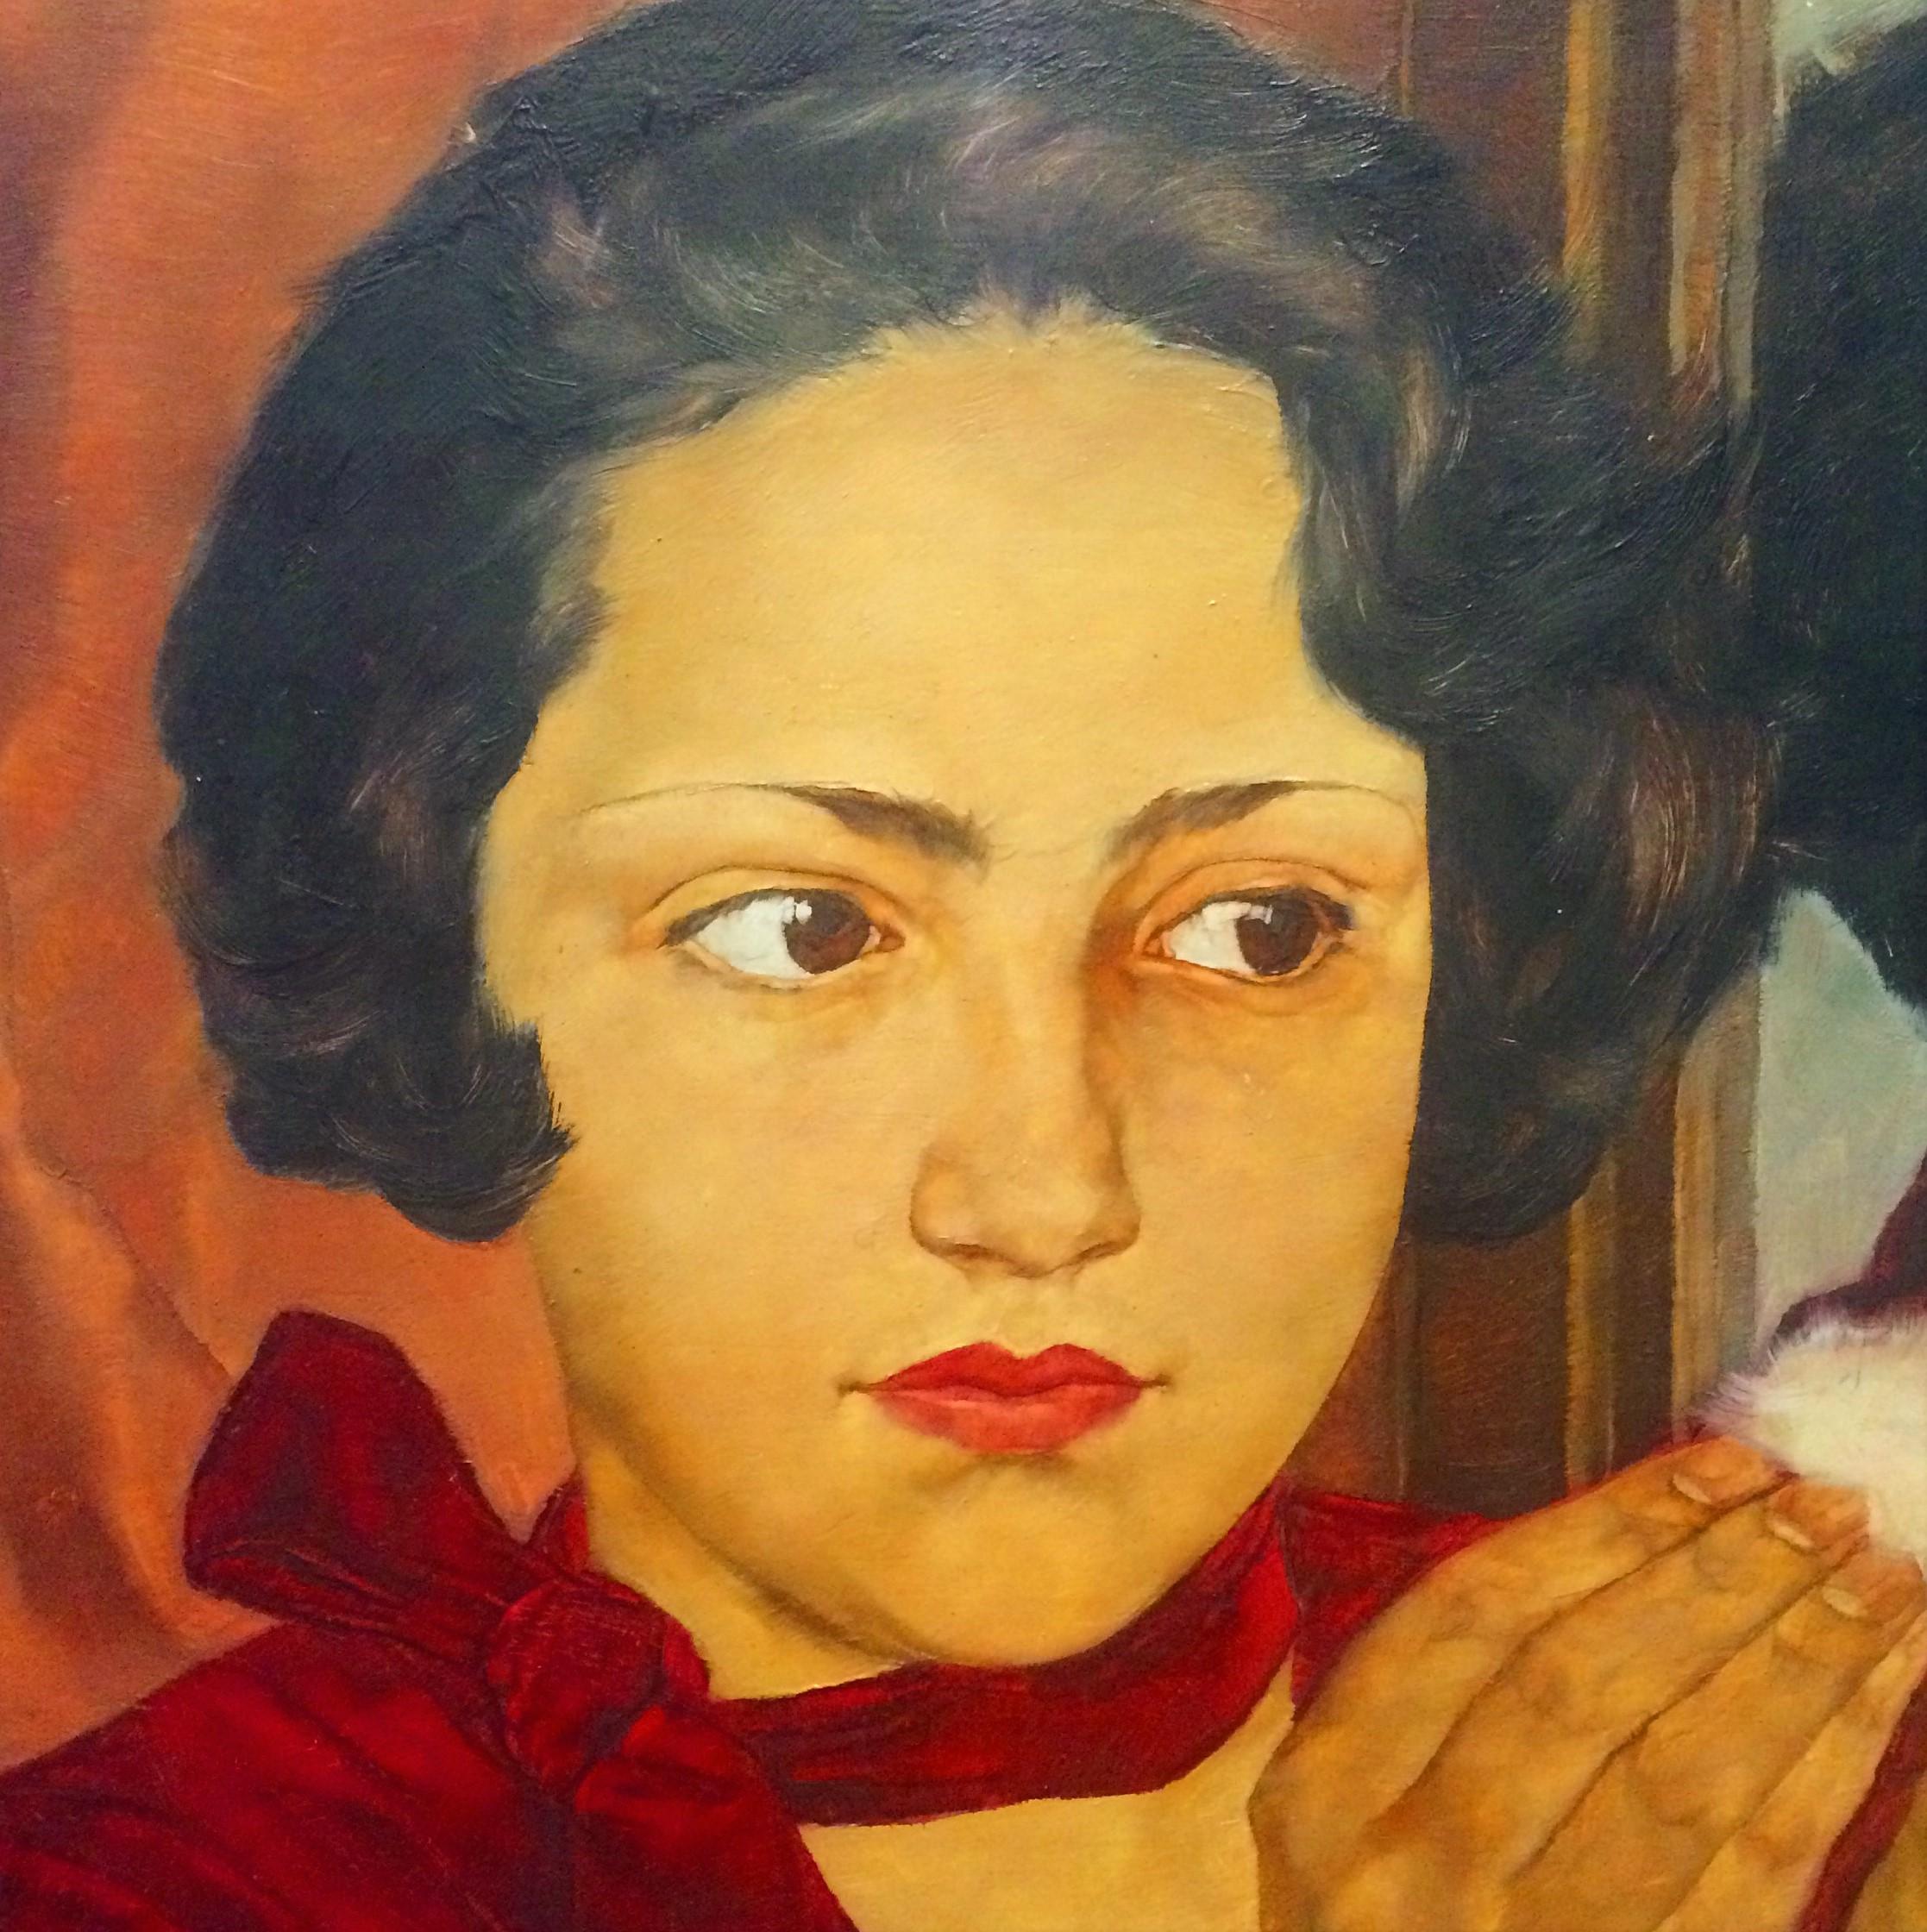 Картинки по запросу Lotte Laserstein 1928, Russian Girl with Compact,